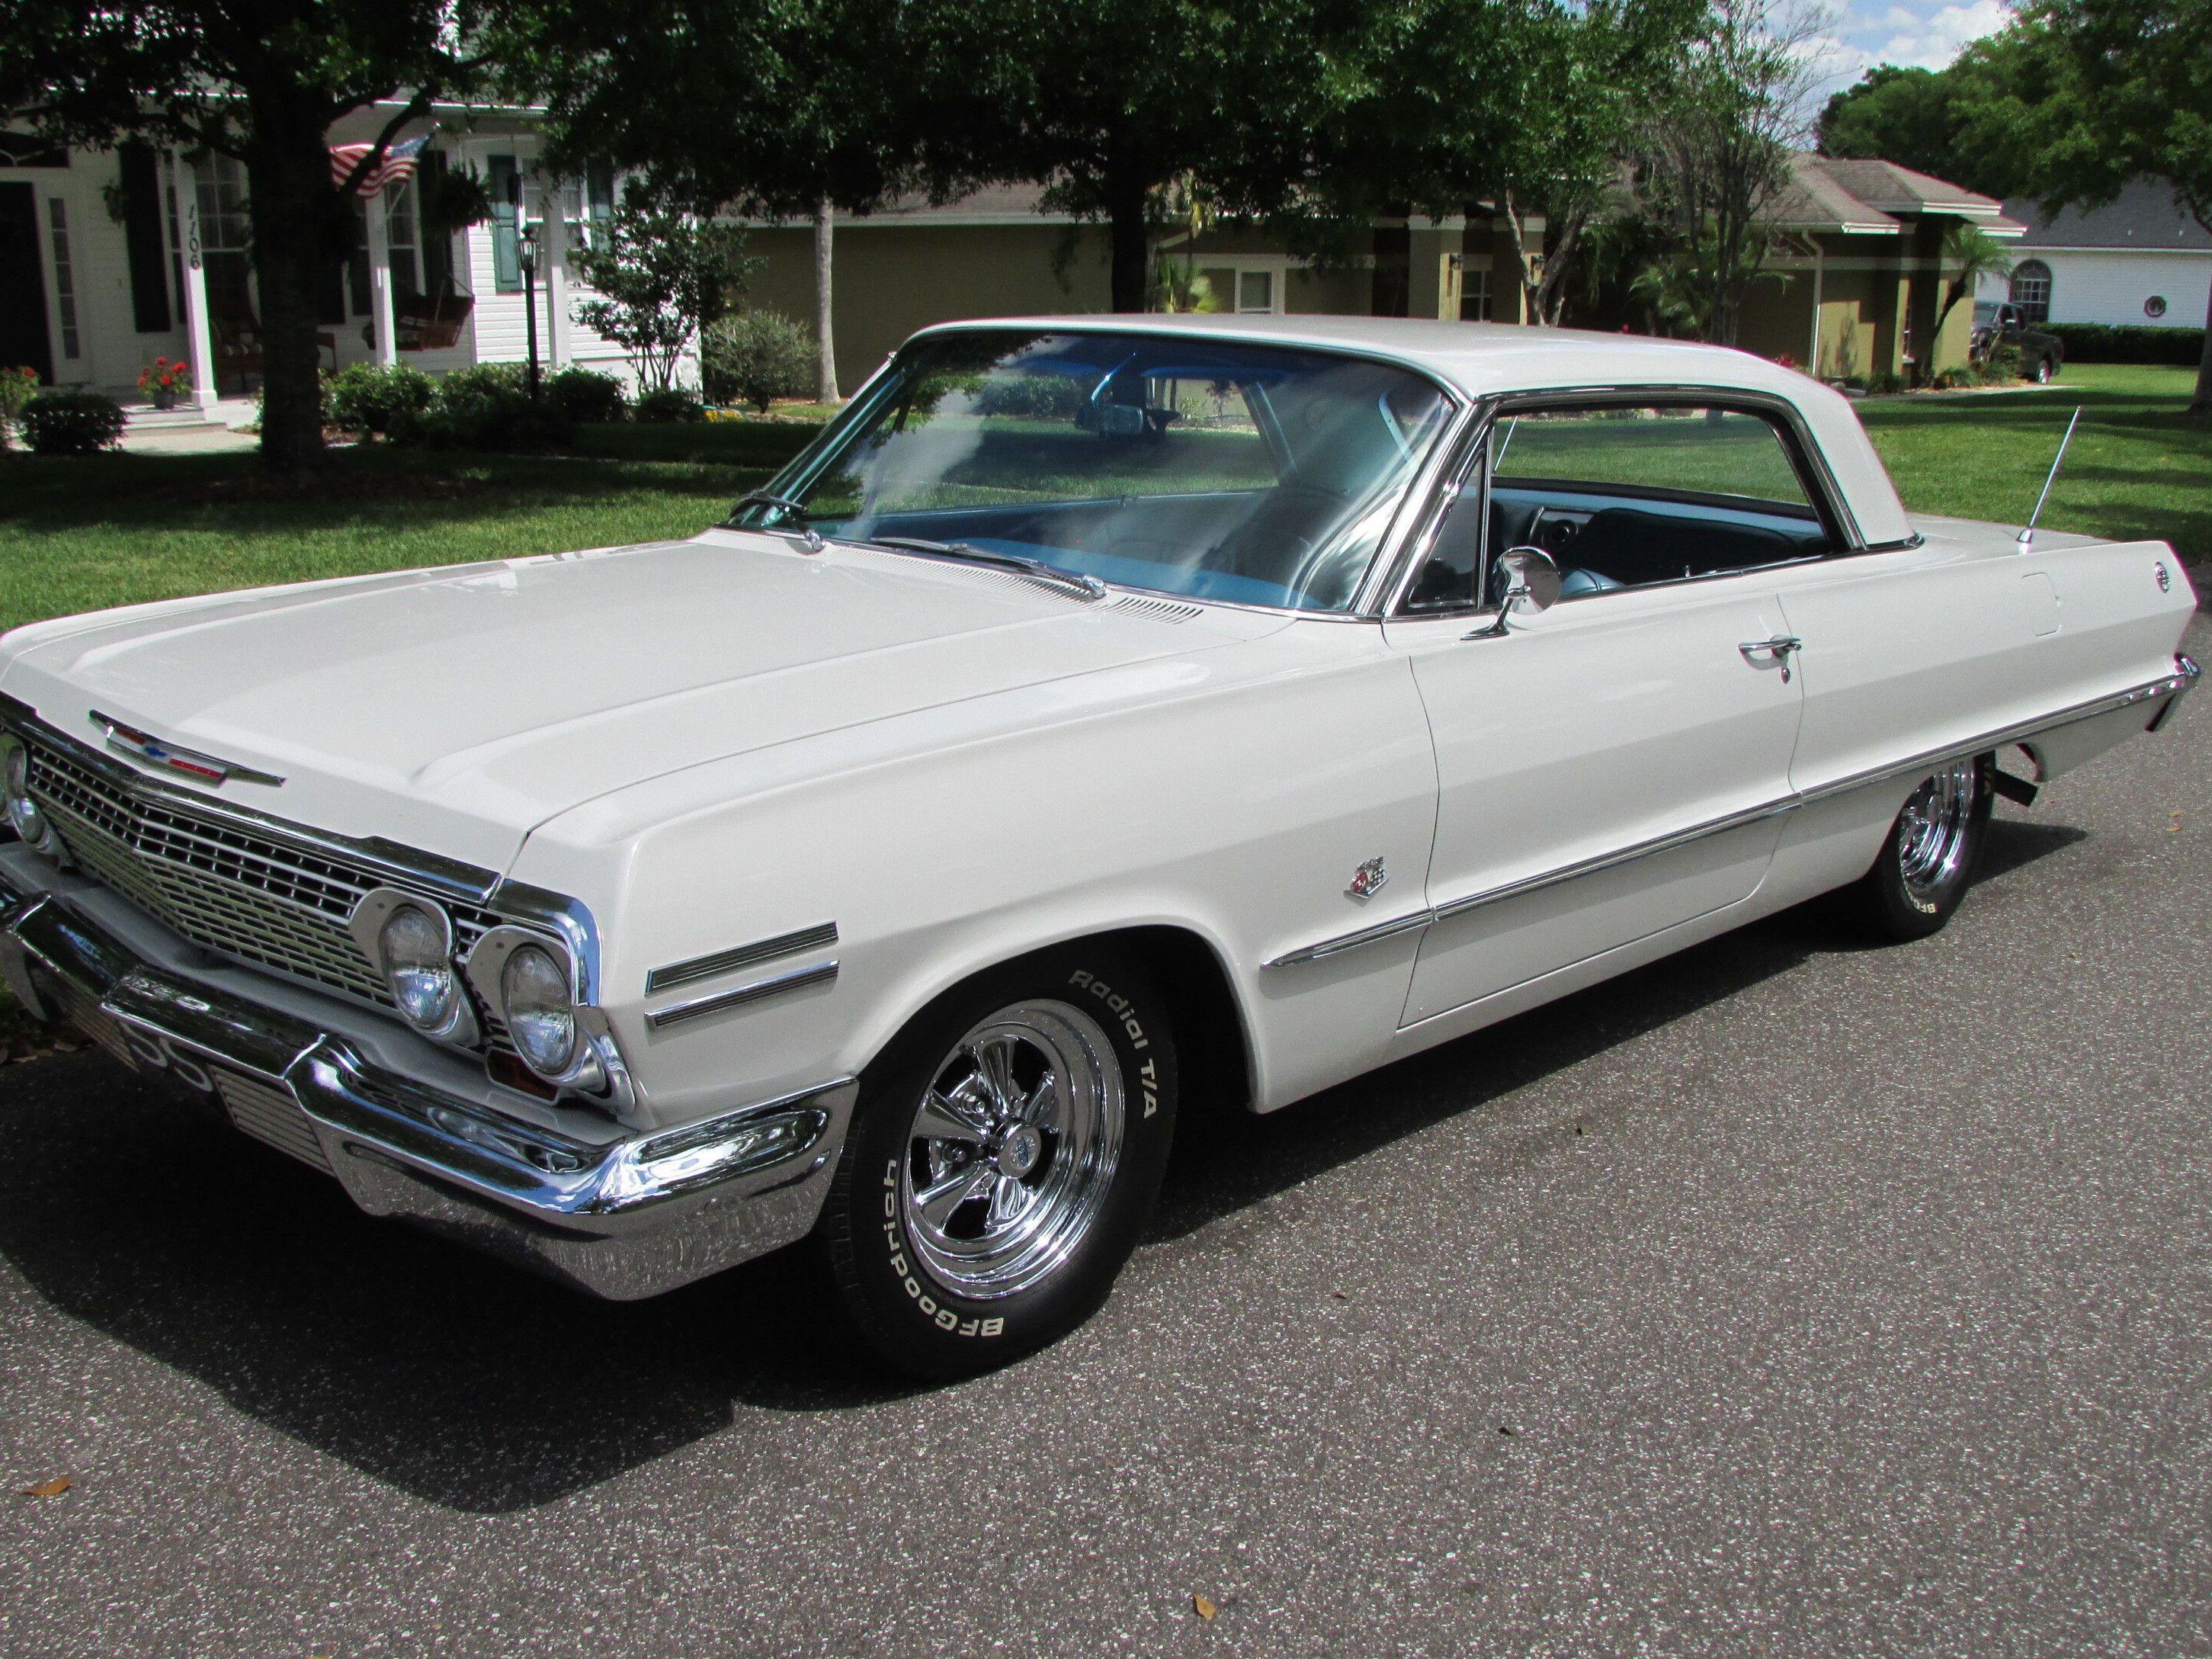 1963 Chevrolet Impala SS Sport Coupe